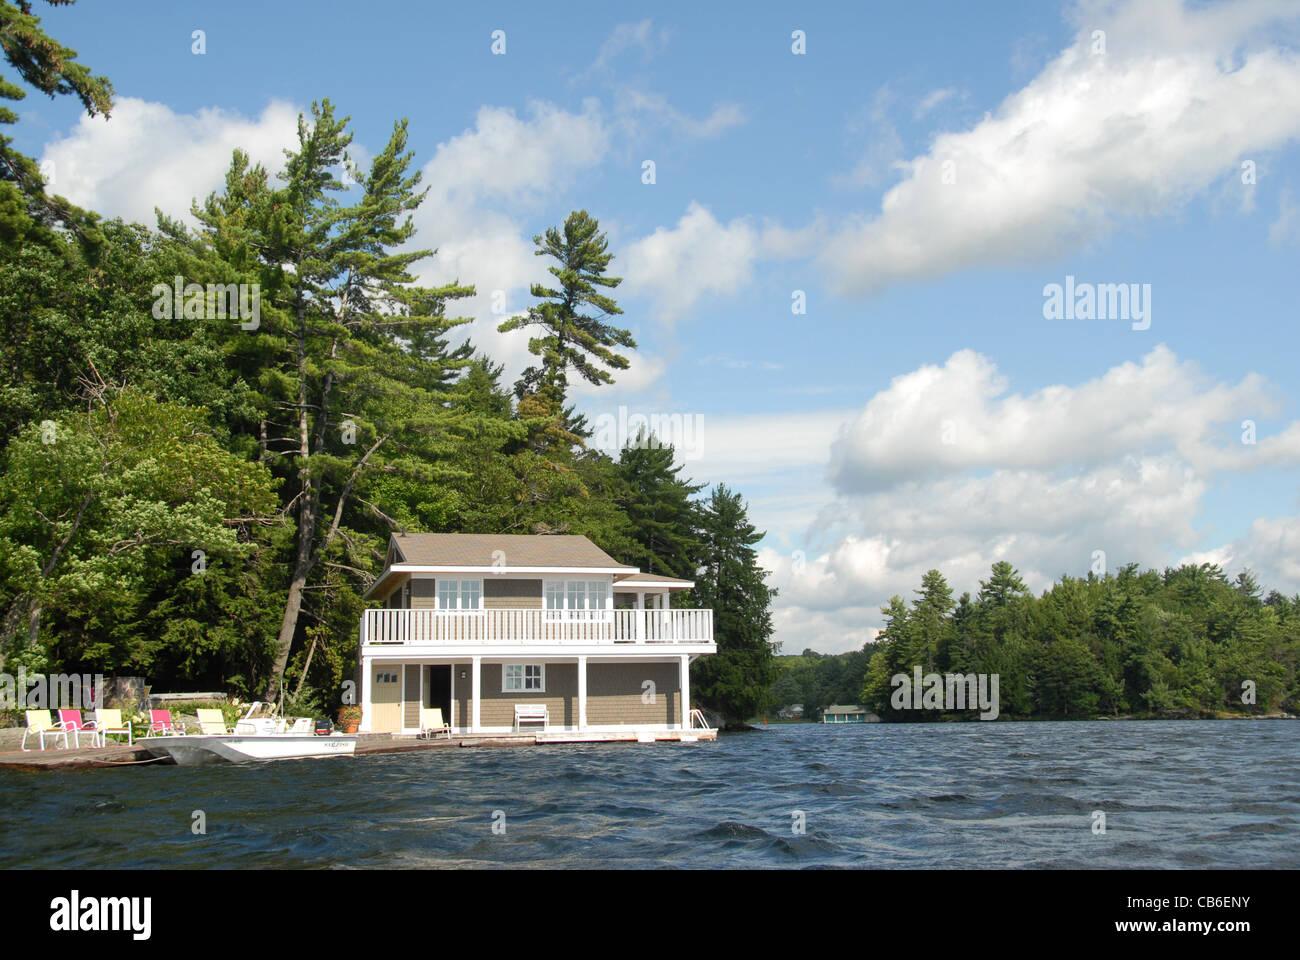 Holiday home near Minett in Muskoka on the banks of Lake Rosseau Stock Photo